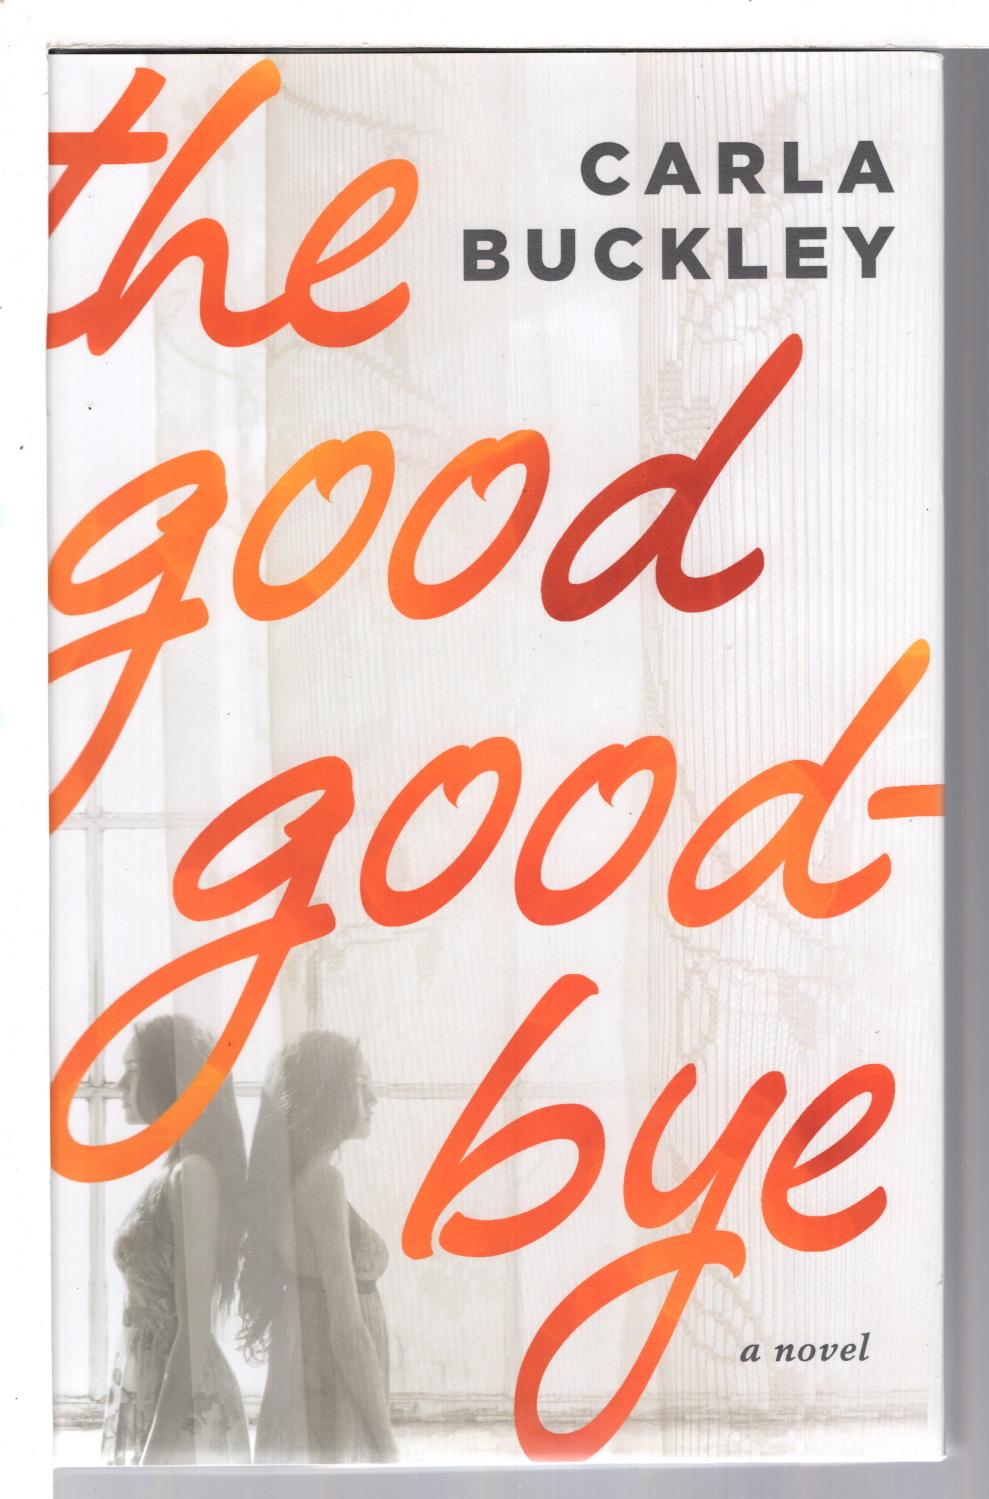 BUCKLEY, CARLA. - THE GOOD GOODBYE.